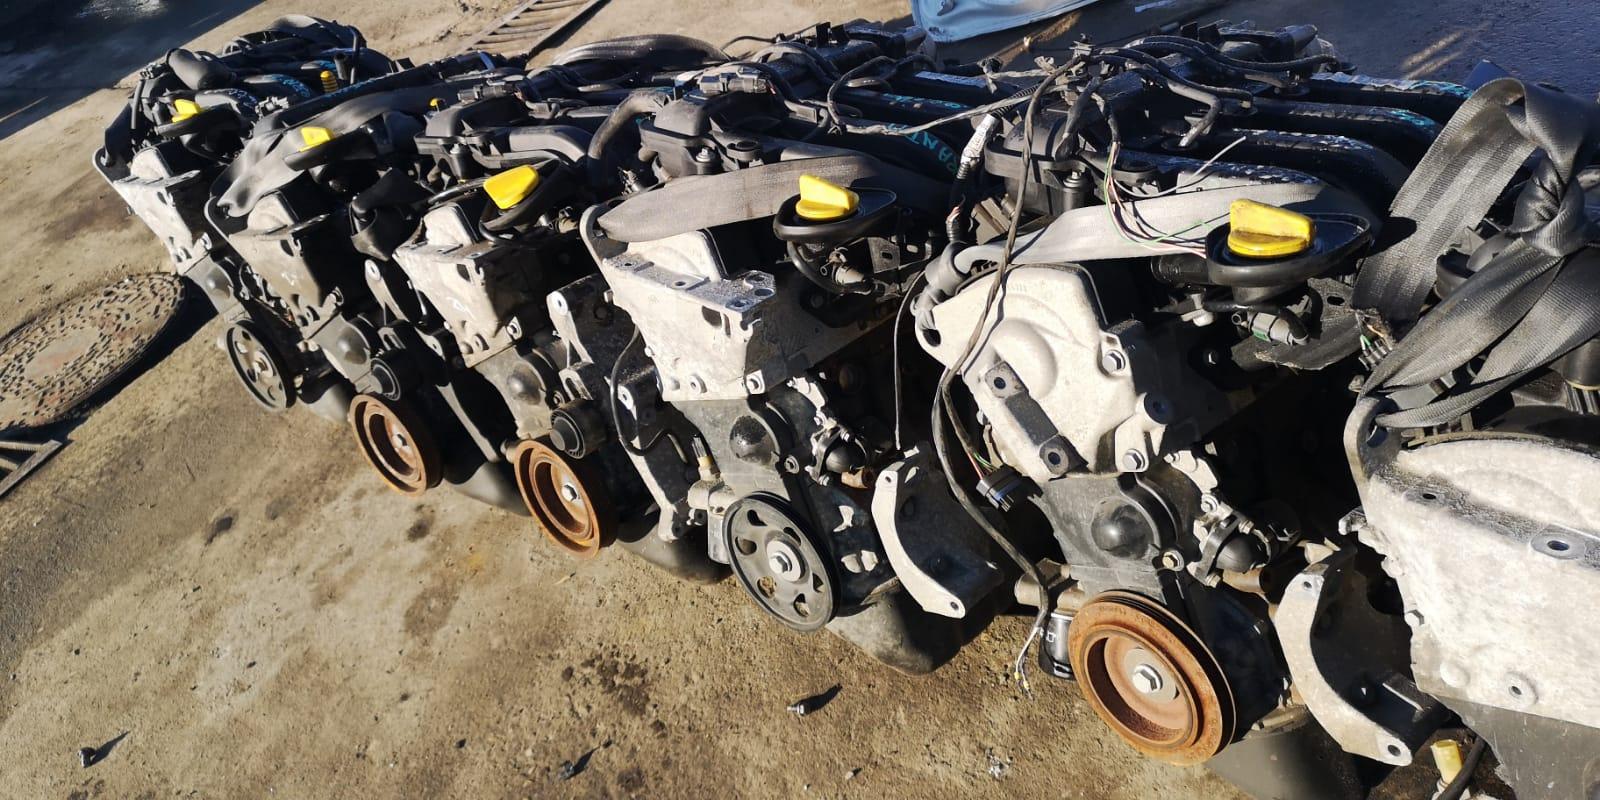 Motor 1.2 benzina 16 valve cod D4F Dacia Logan,Sandero,Renault Symbol,Twingo,Clio